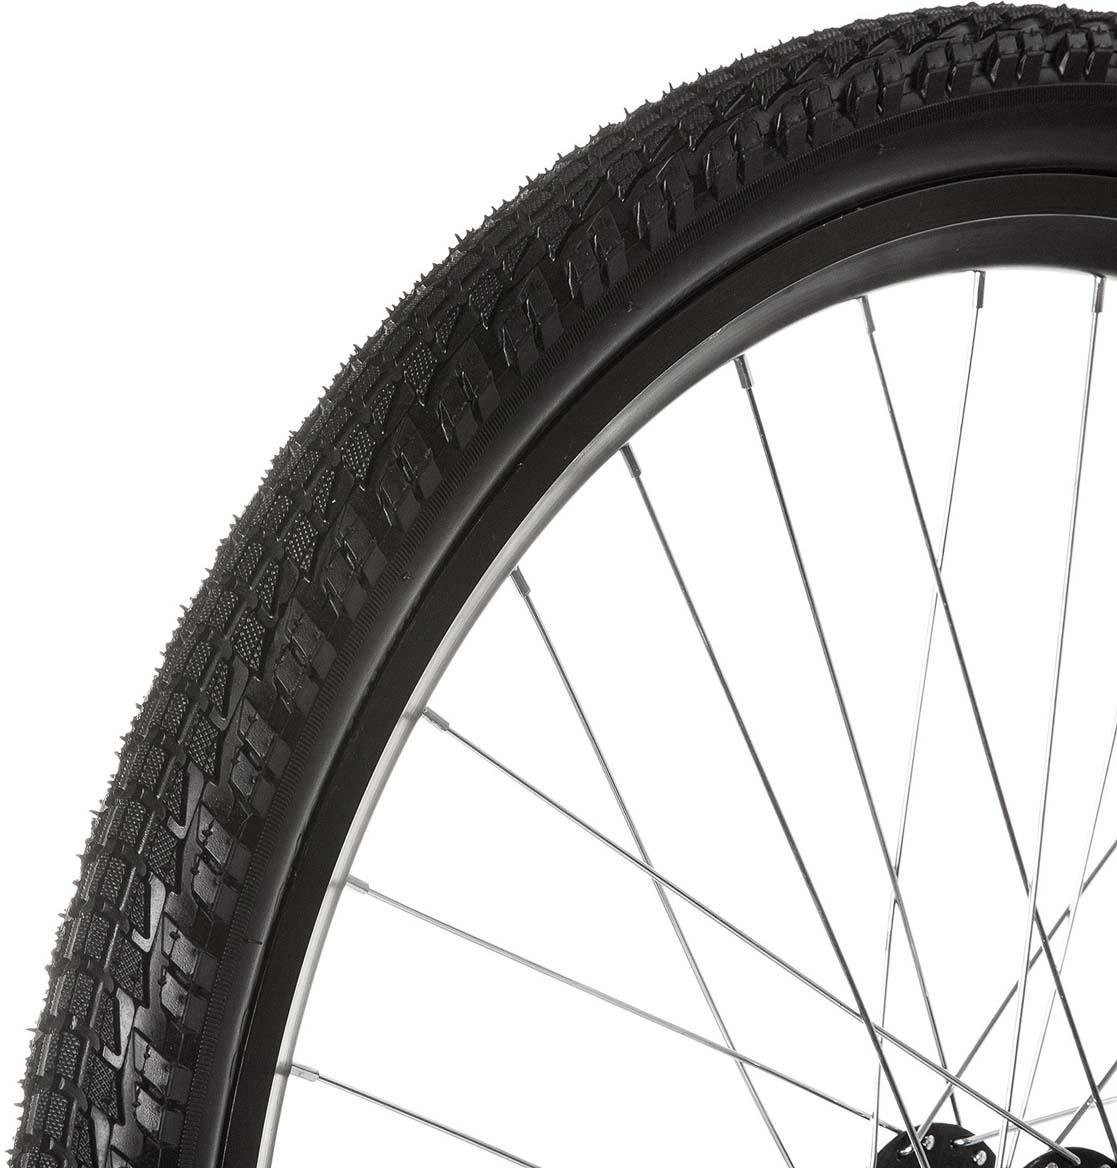 Покрышка велосипедная средняя Kenda, 26 х 2.10. 5-524788 (54-559) K892 покрышка kenda 700х40c k 1024 корд 60 tpi